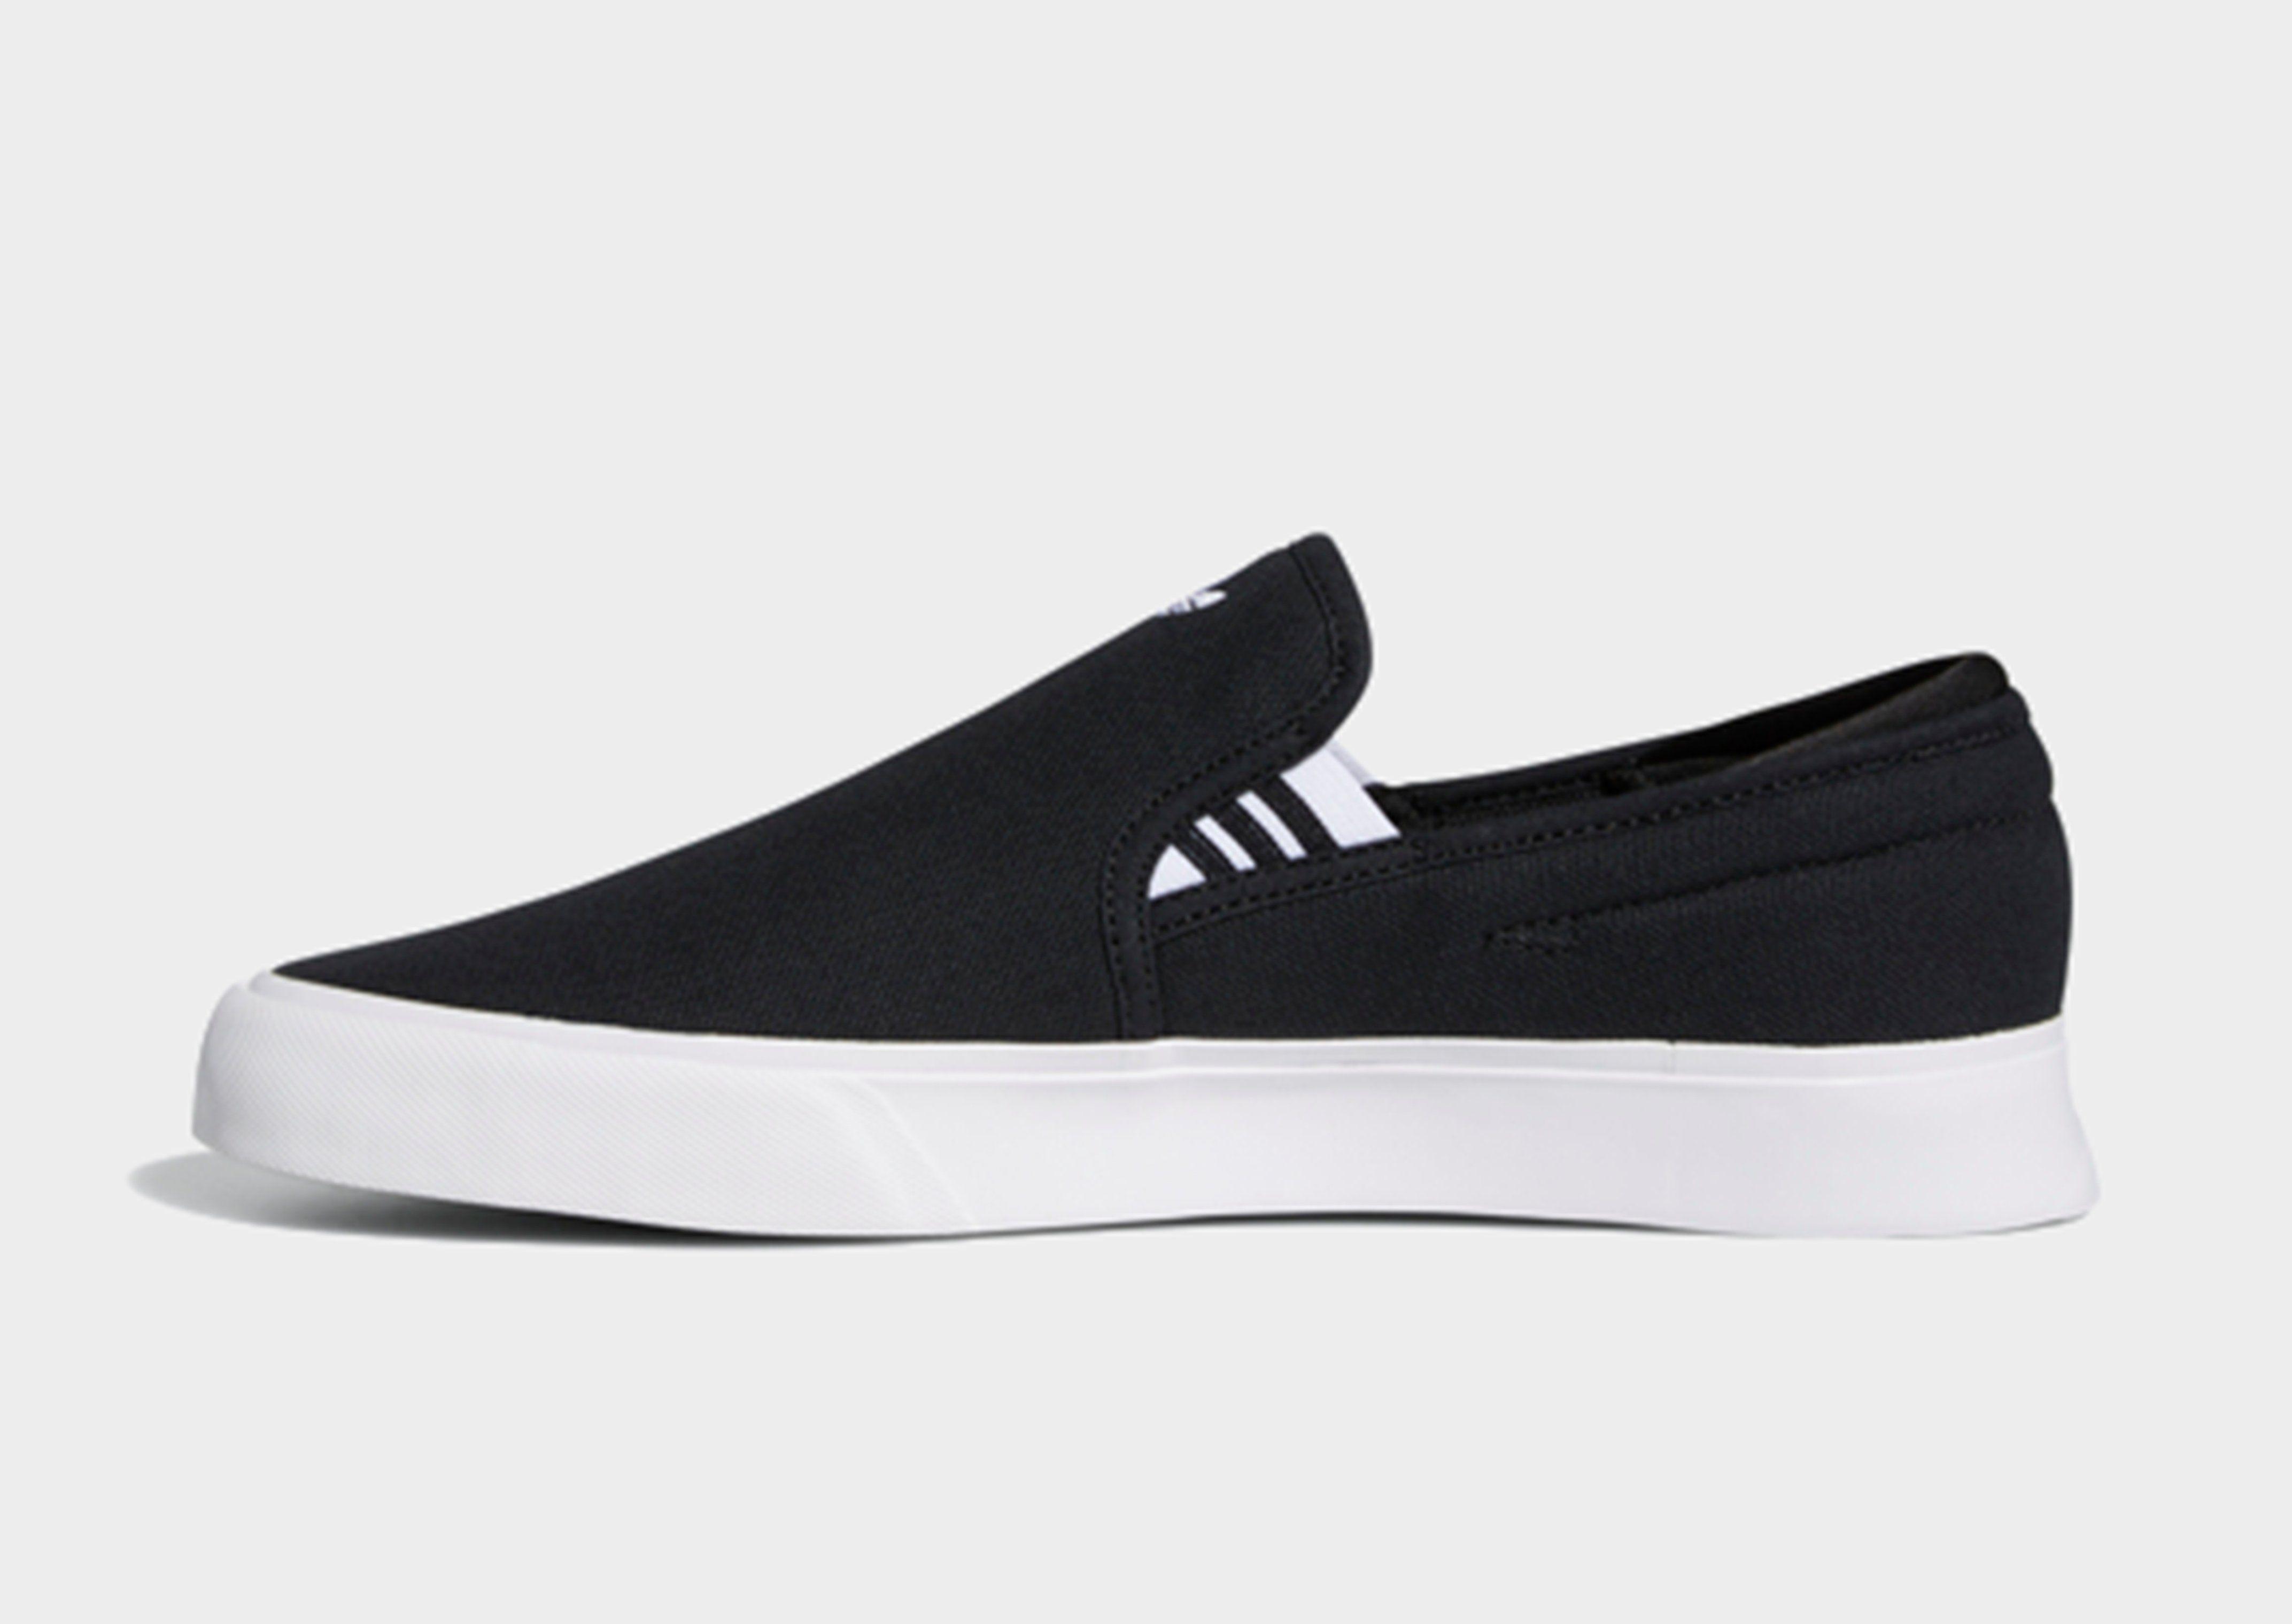 Adidas Sports Slip On Sabalo Originals ShoesJd 8n0Nvmw